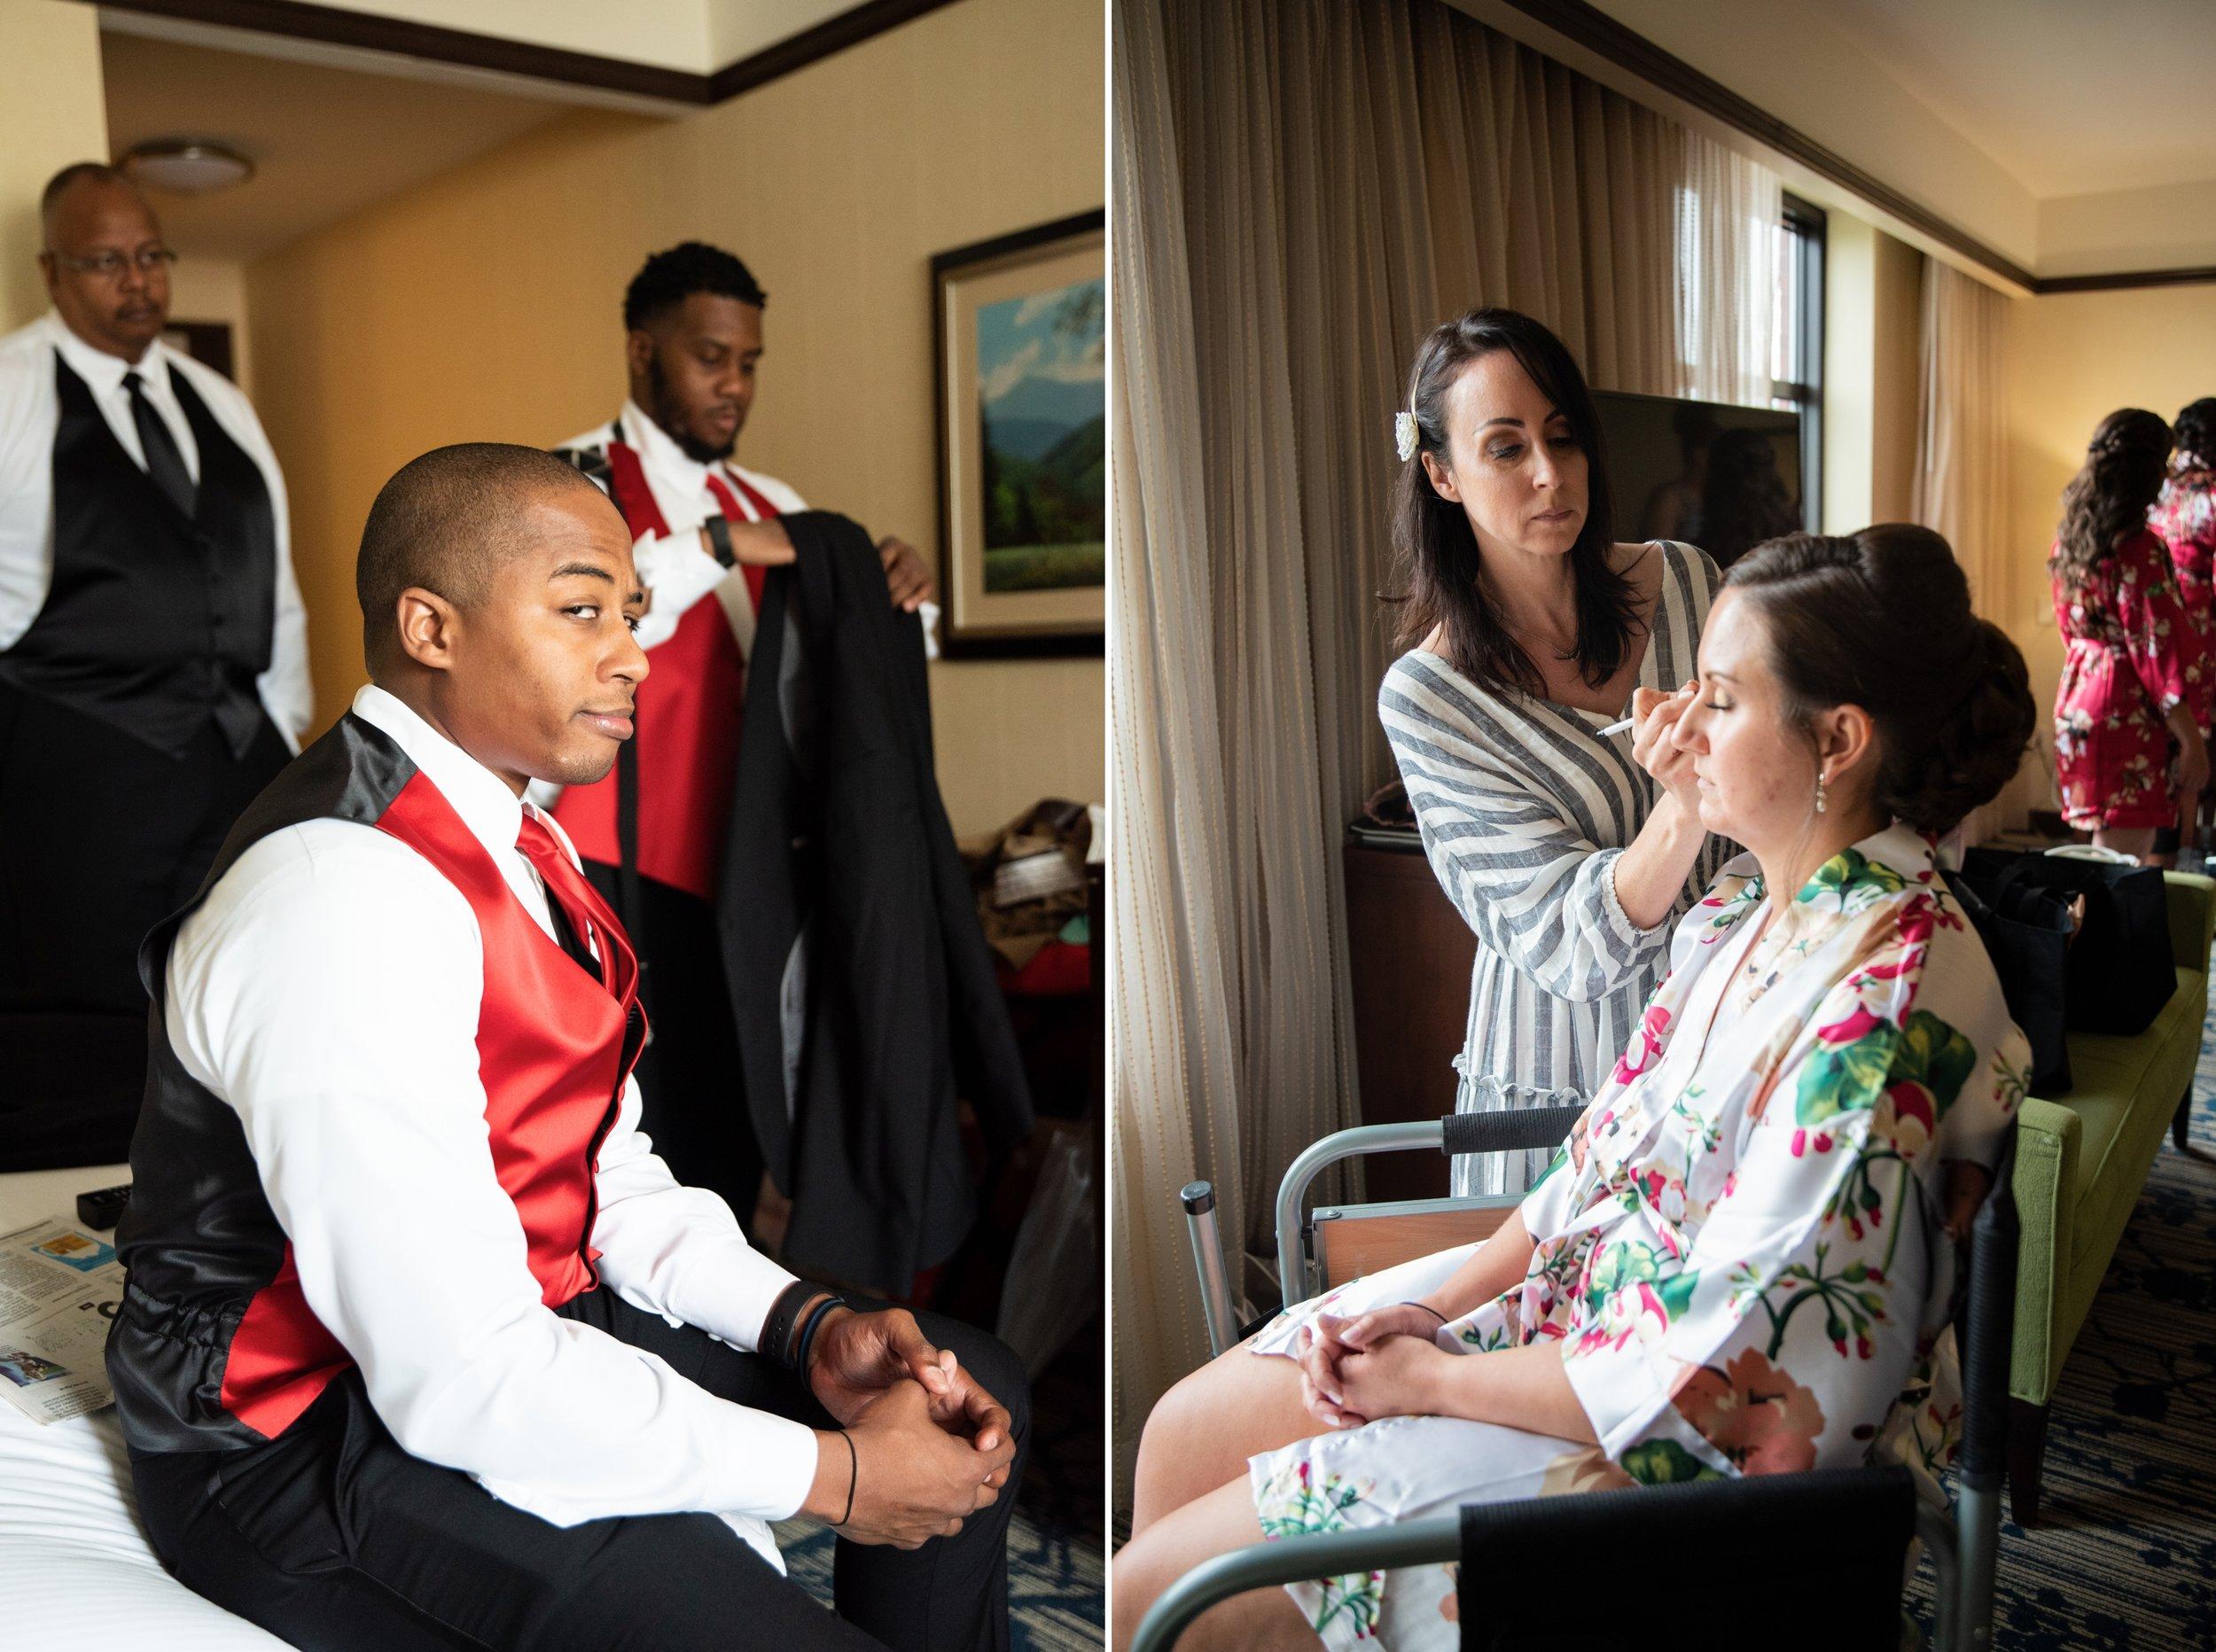 High Vista Wedding - Asheville Vendors  2.jpg